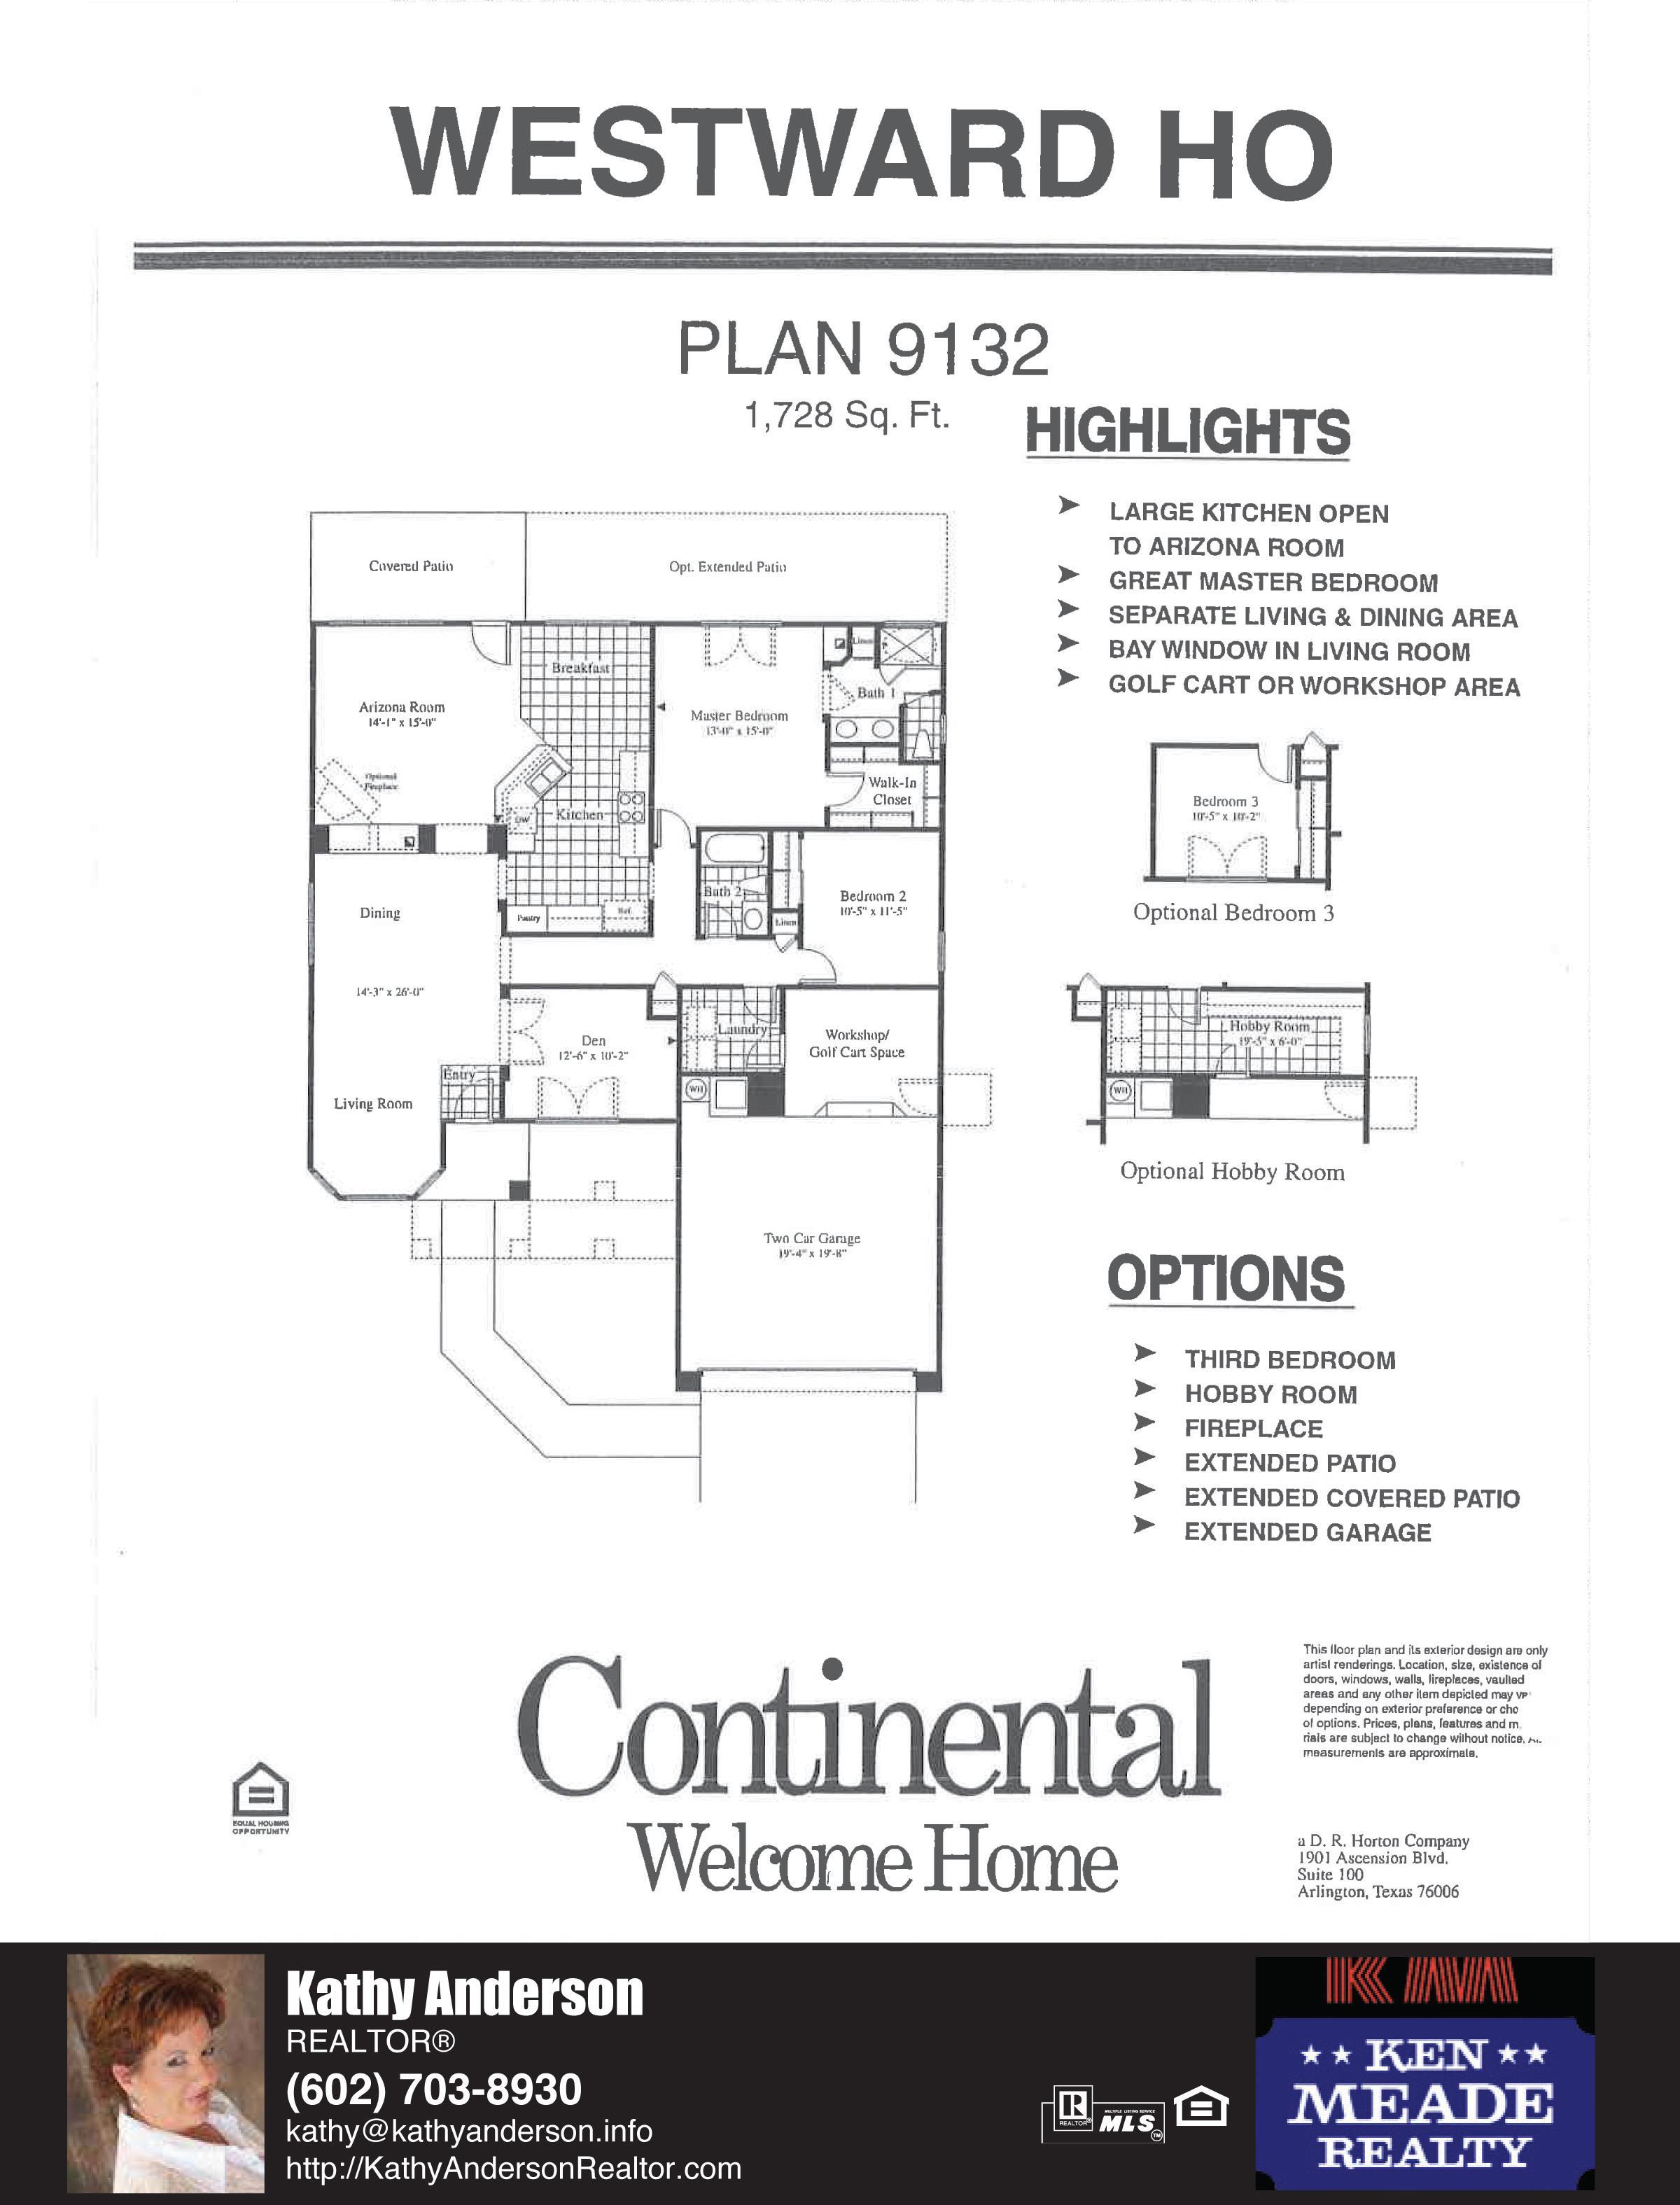 Arizona Traditions Westward Ho Floor Plan Model Home Plans Floorplans Models in Surprise Arizona AZ Top Ken Meade Realty Realtor agent Kathy Anderson